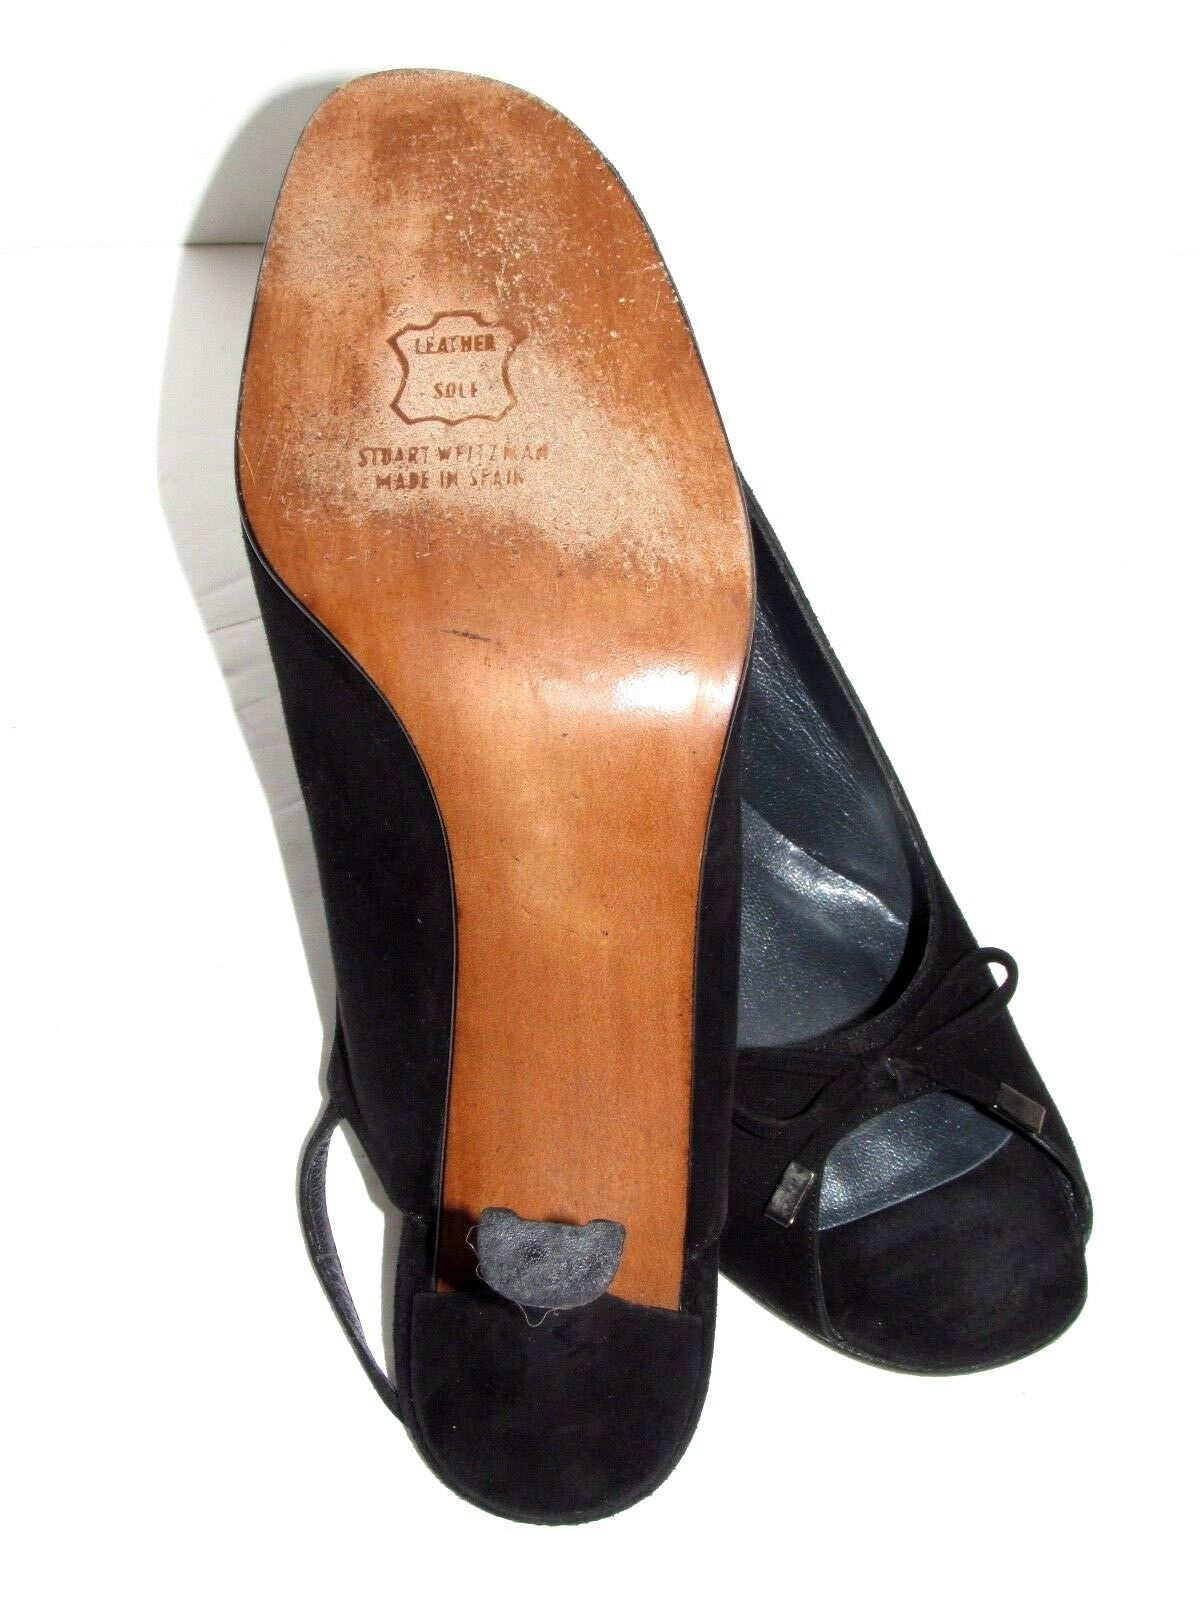 STUART STUART STUART WEITZMAN Black Suede Peep Toe Slingback Heels shoes SZ 9.5 M 5ac271